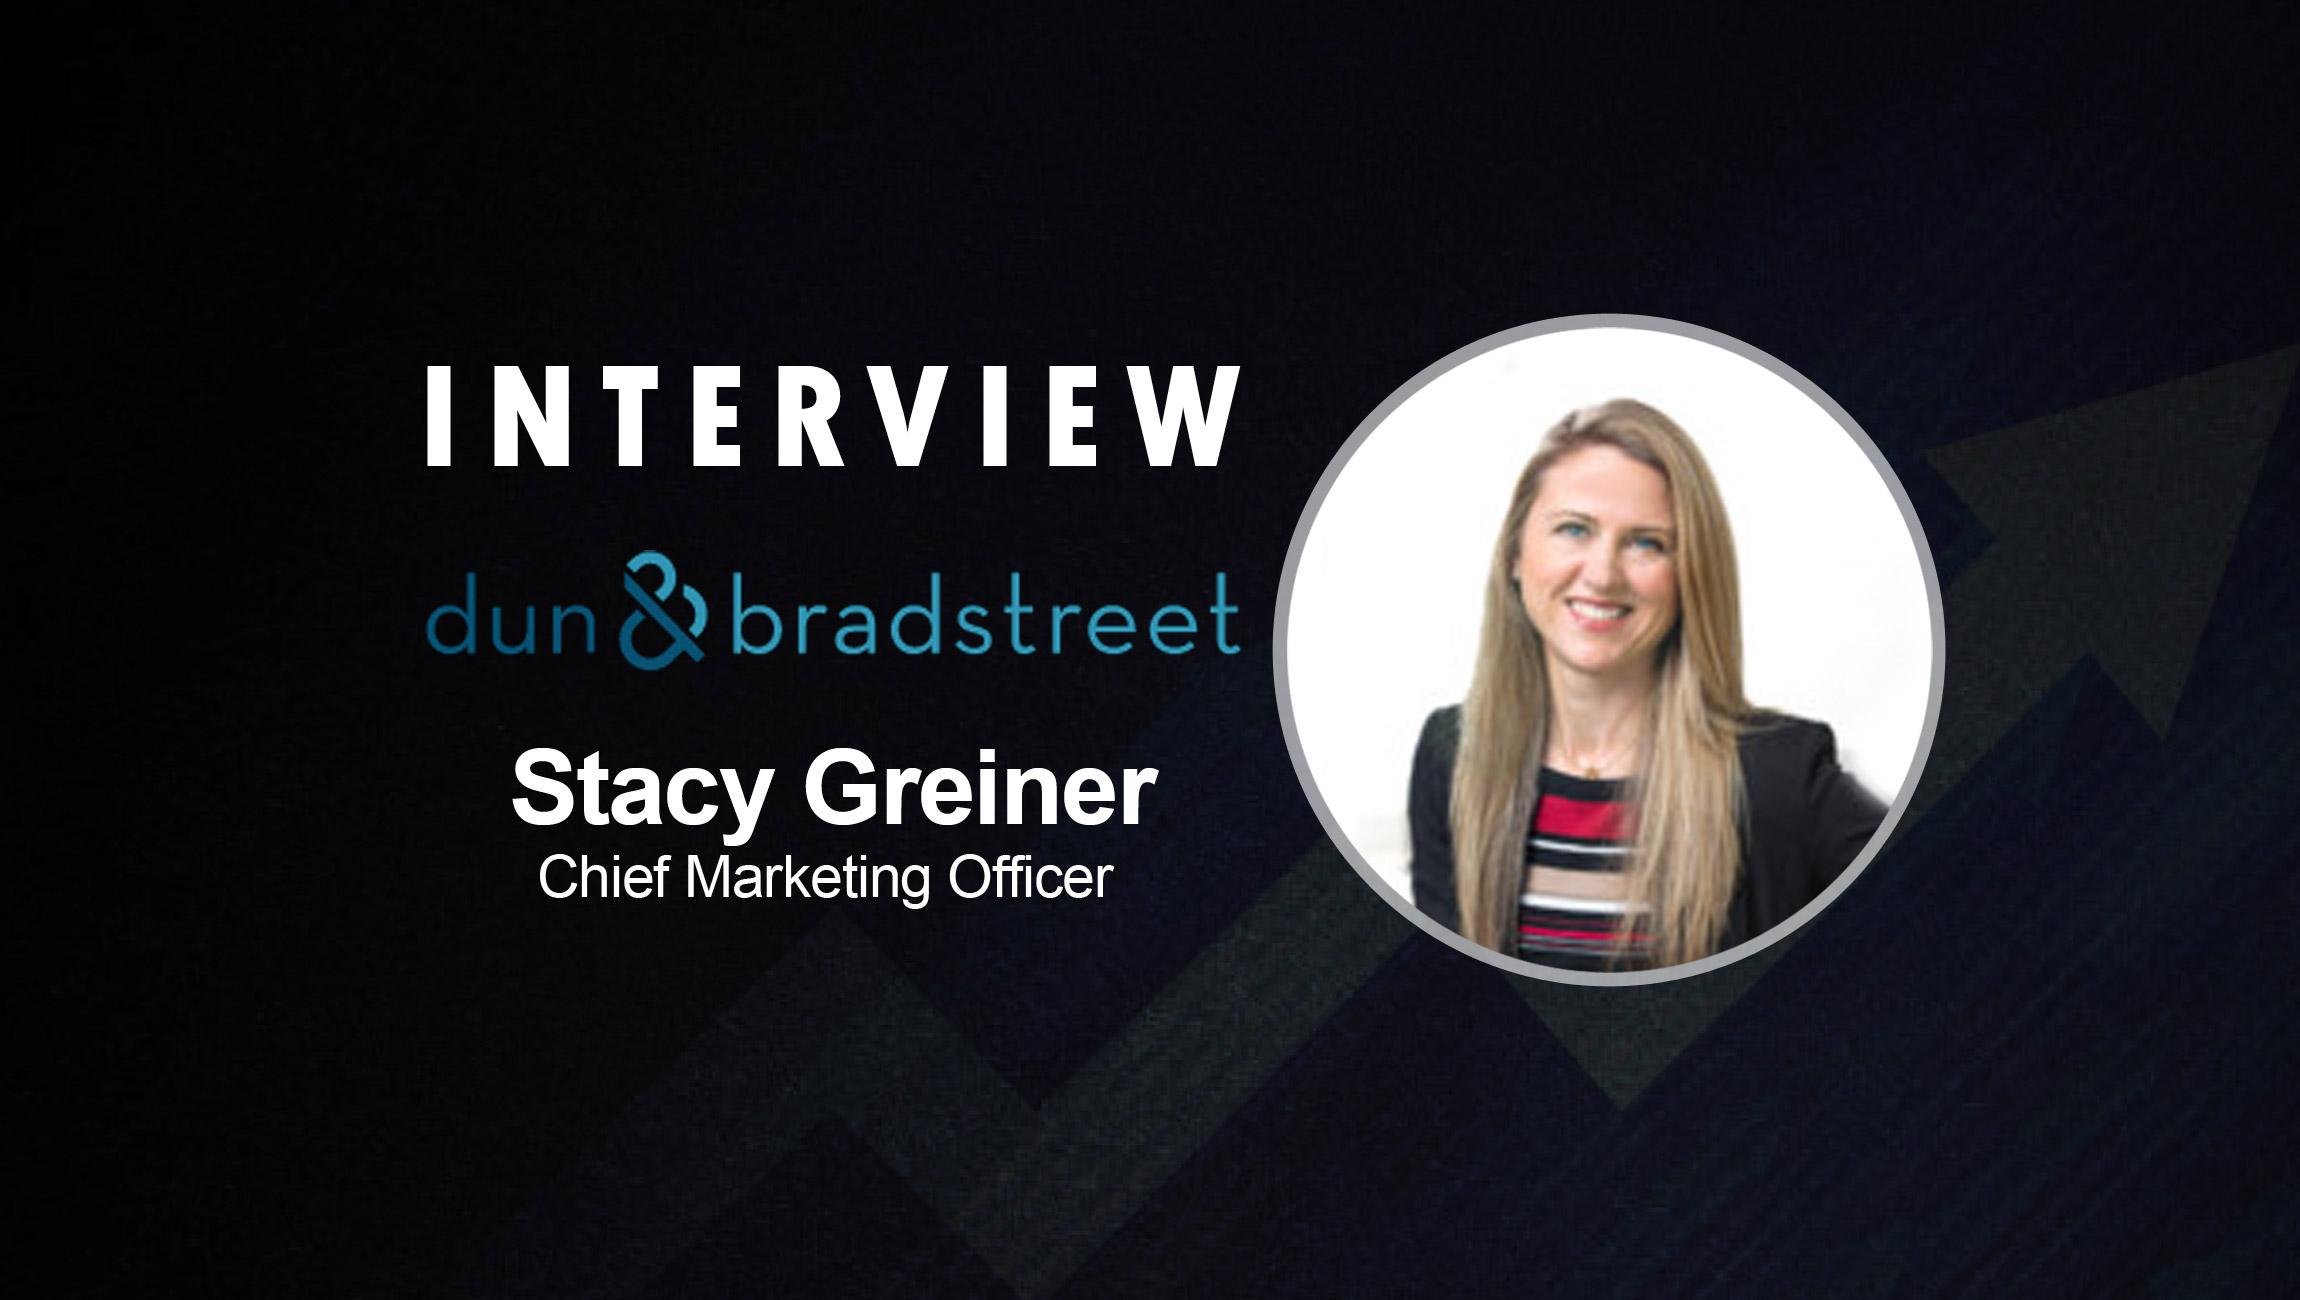 SalesTechStar Interview with Stacy Greiner, Chief Marketing Officer at Dun & Bradstreet